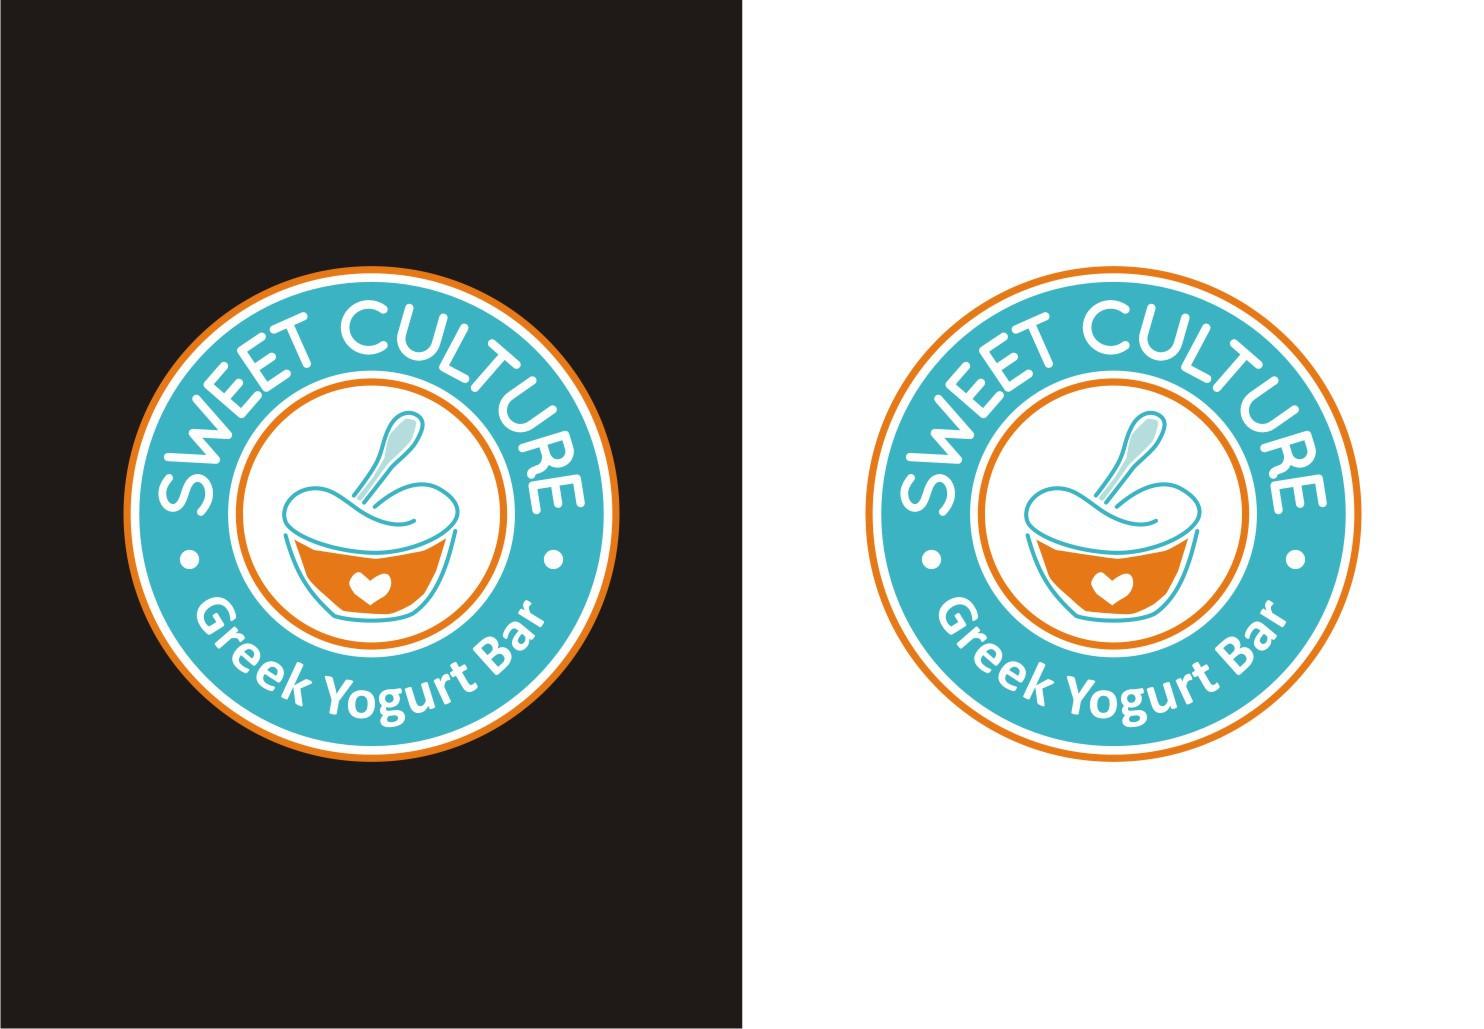 Sweet Culture